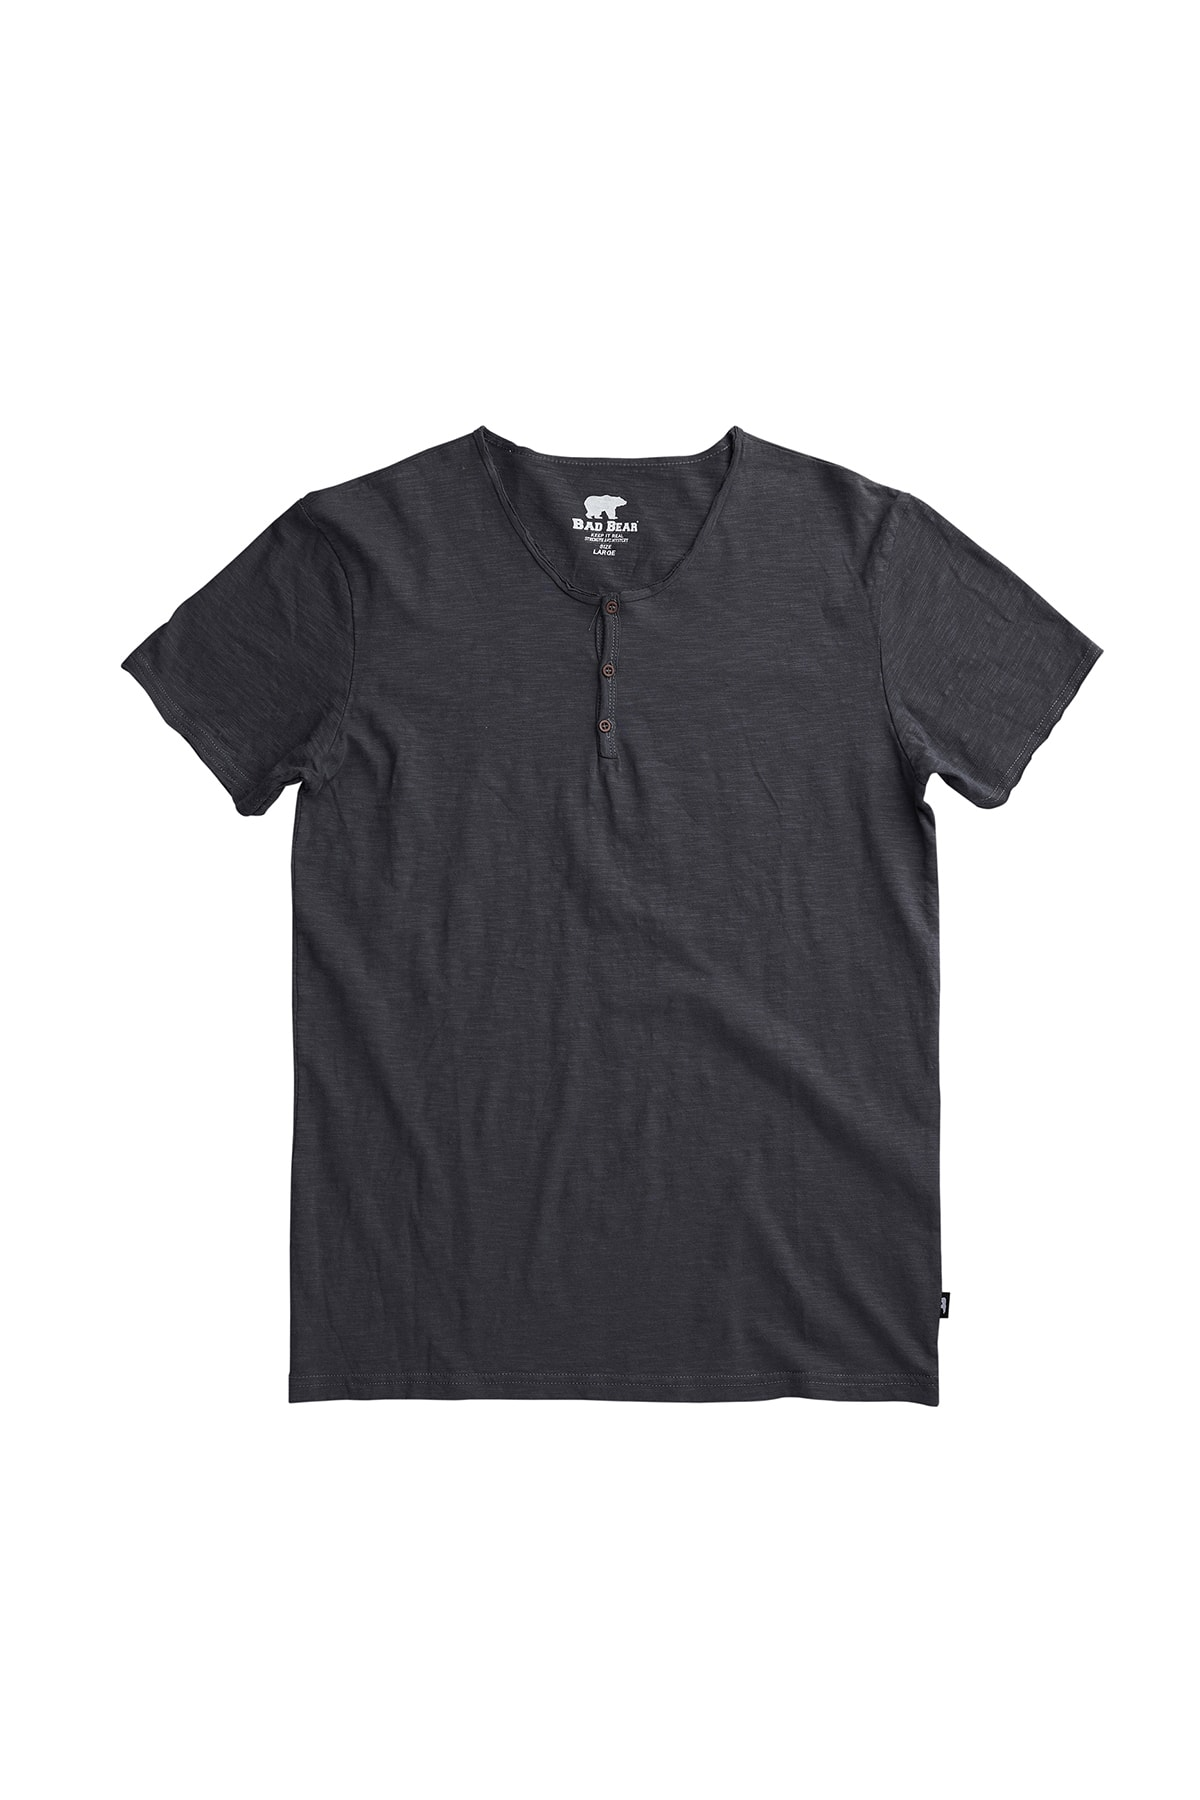 Bad Bear Erkek Tişört Button 17.01.07.013-RVN 1